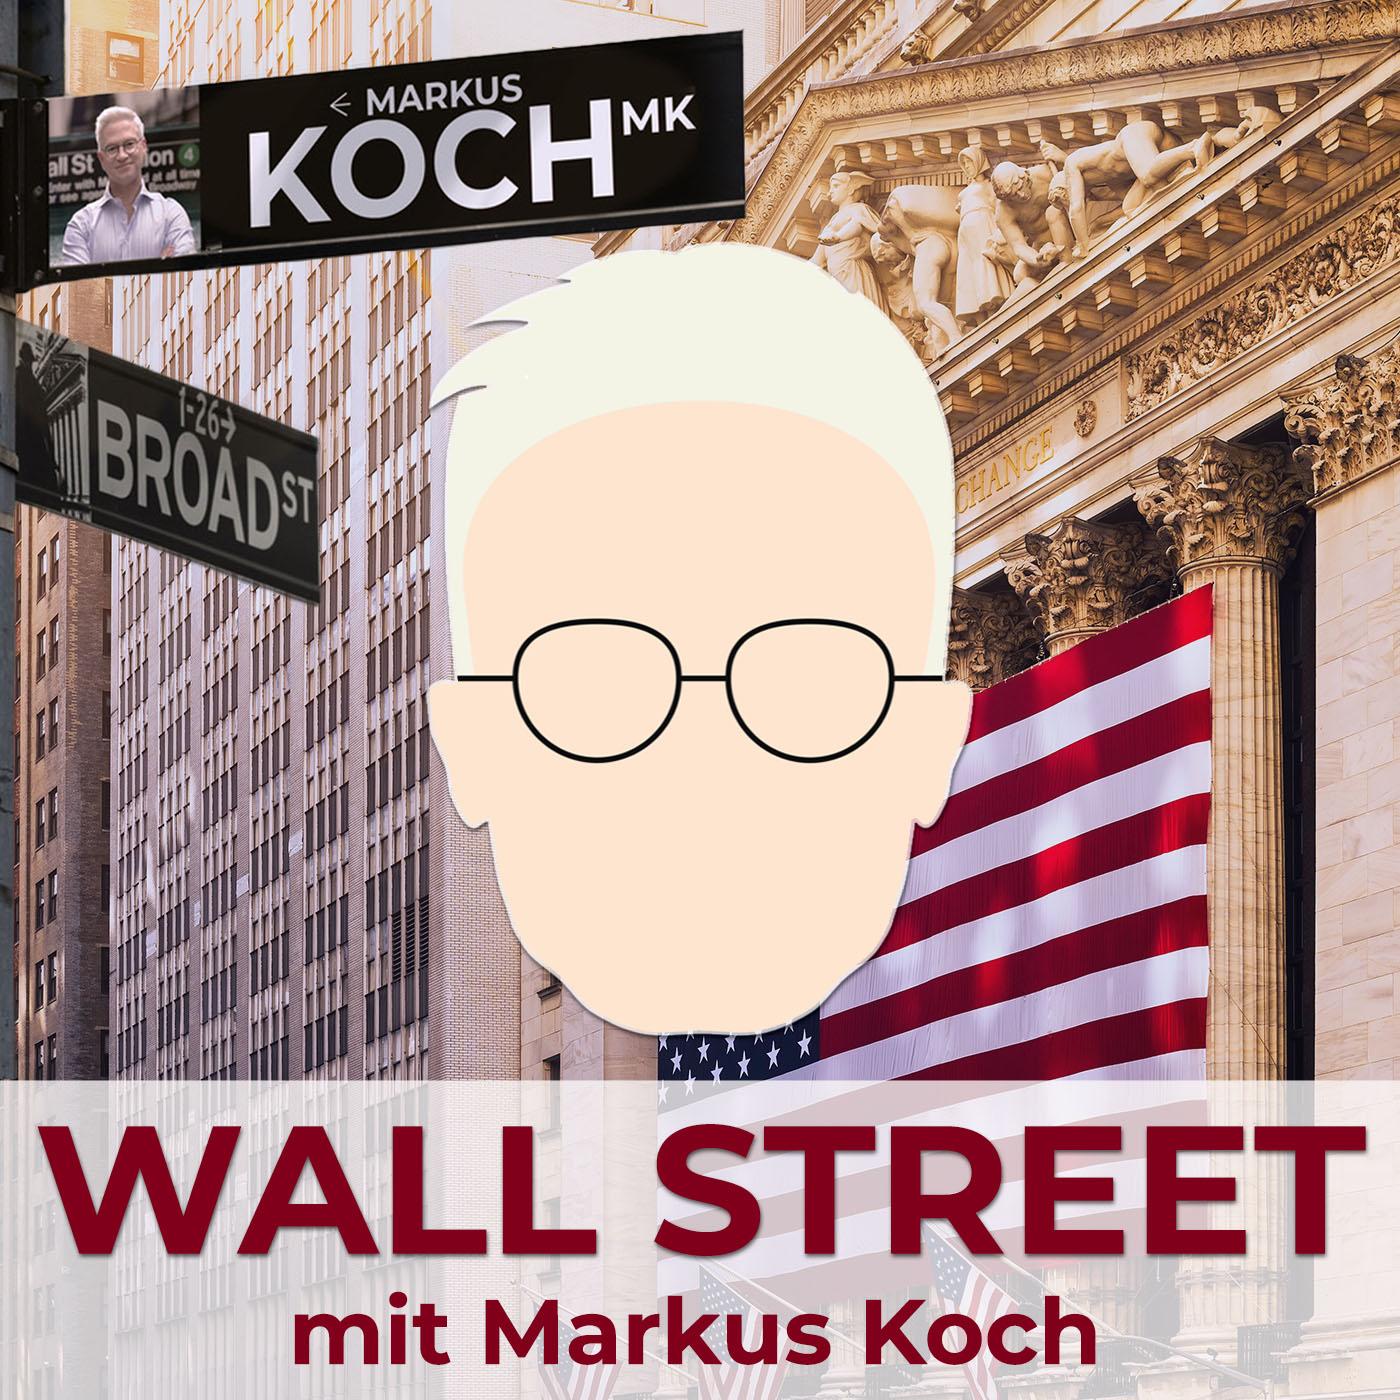 Heißer Sommertag, flaue Wall Street | Banken, Boeing, Biogen, Facebook